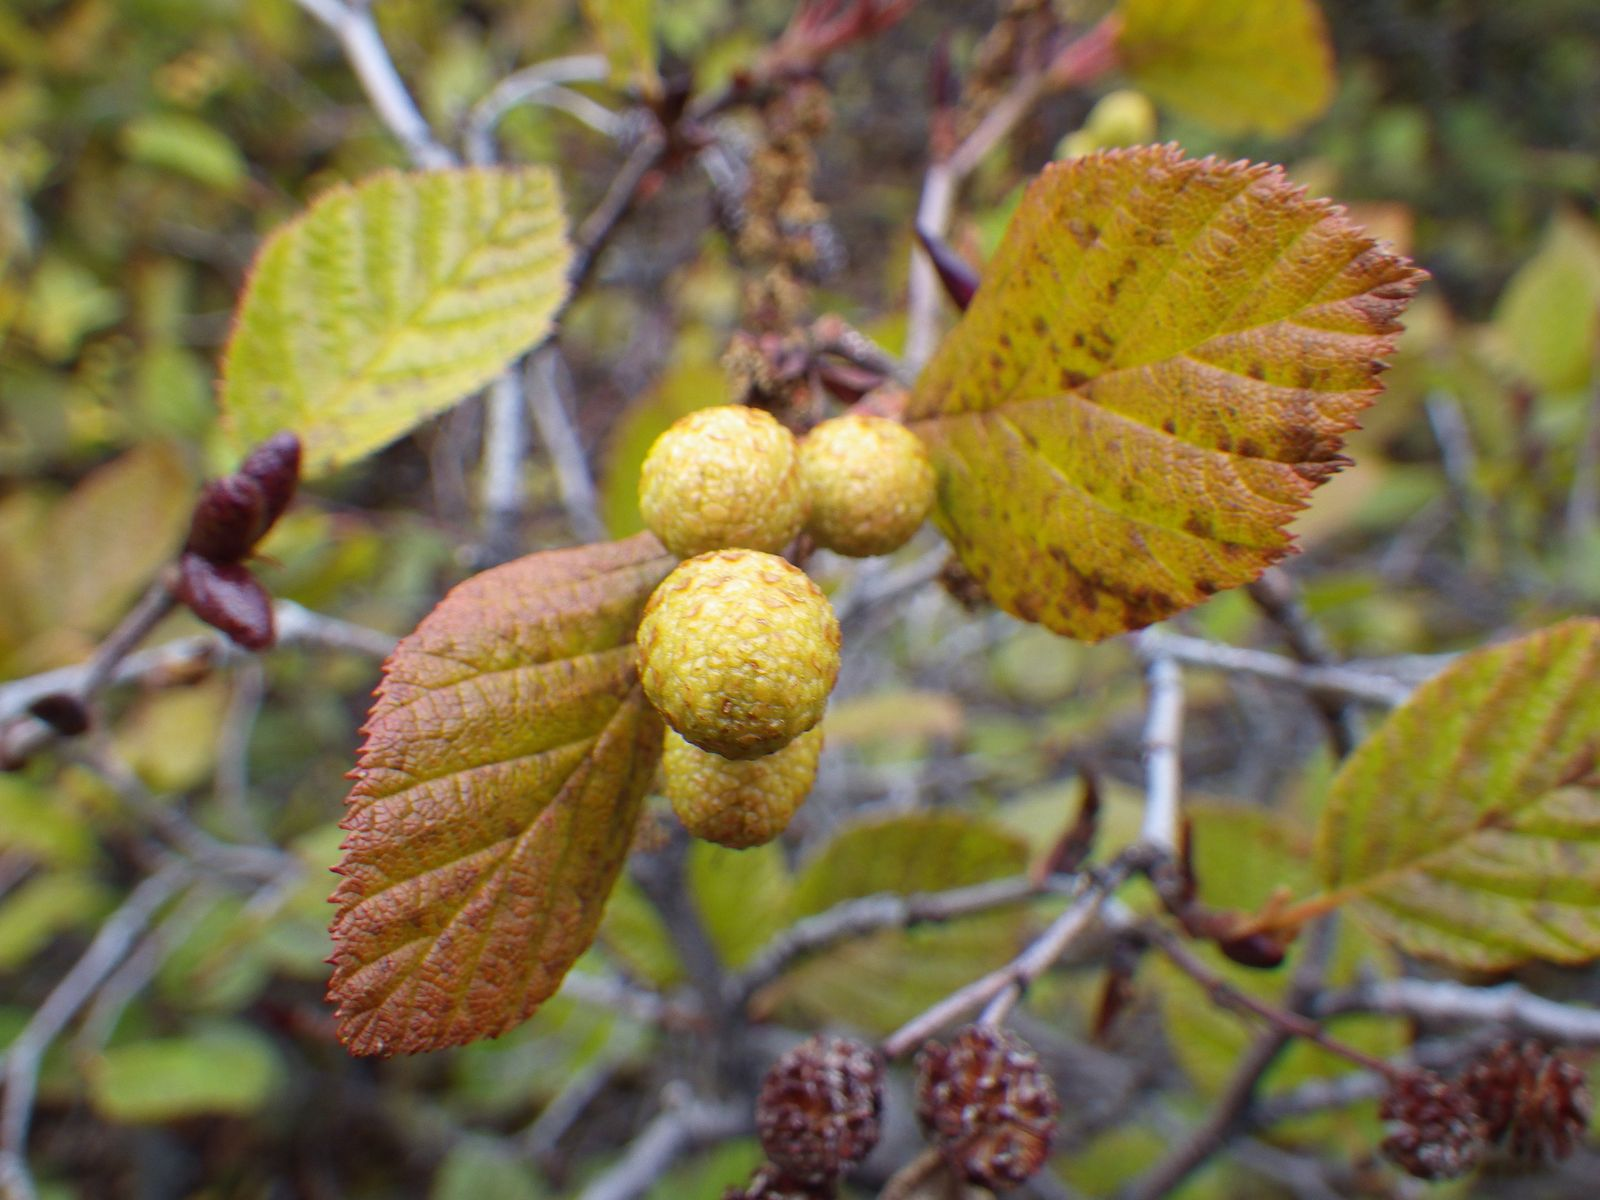 2013-09-28-1744_-_gode_1_vegetation_2_2_